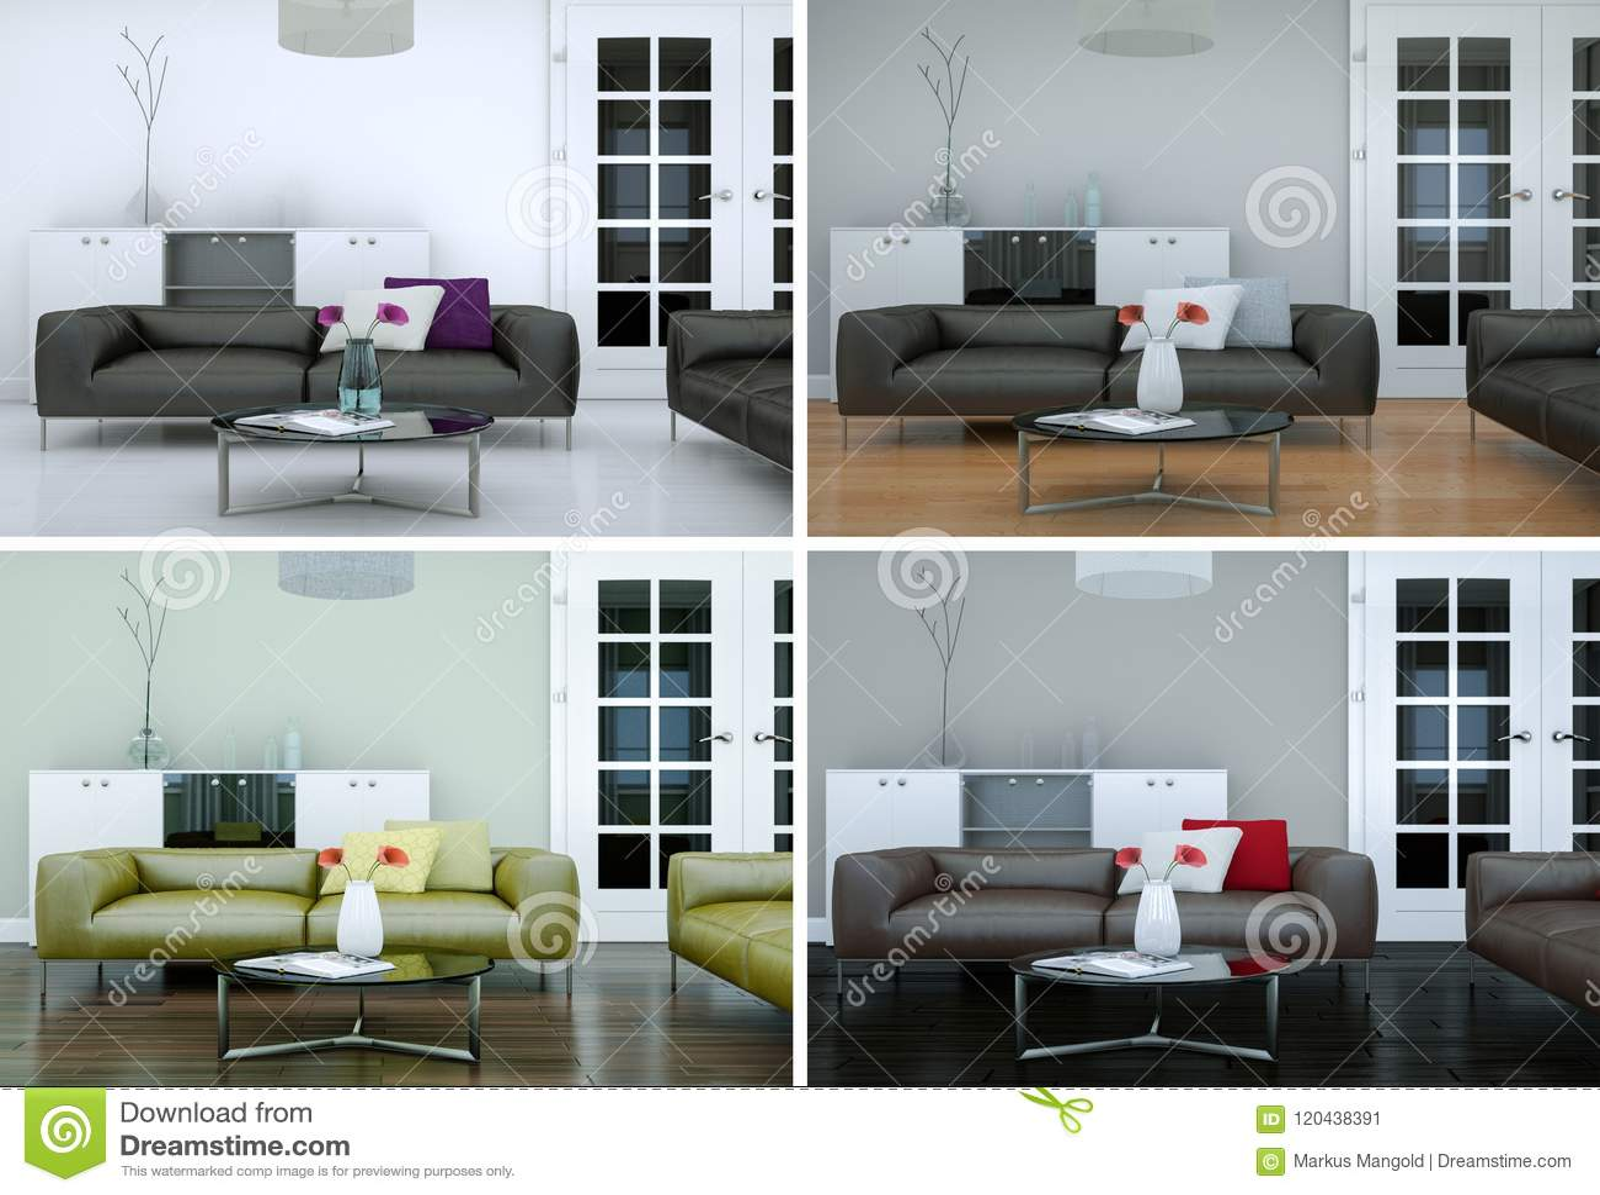 Four color variations of modern interior loft design stock